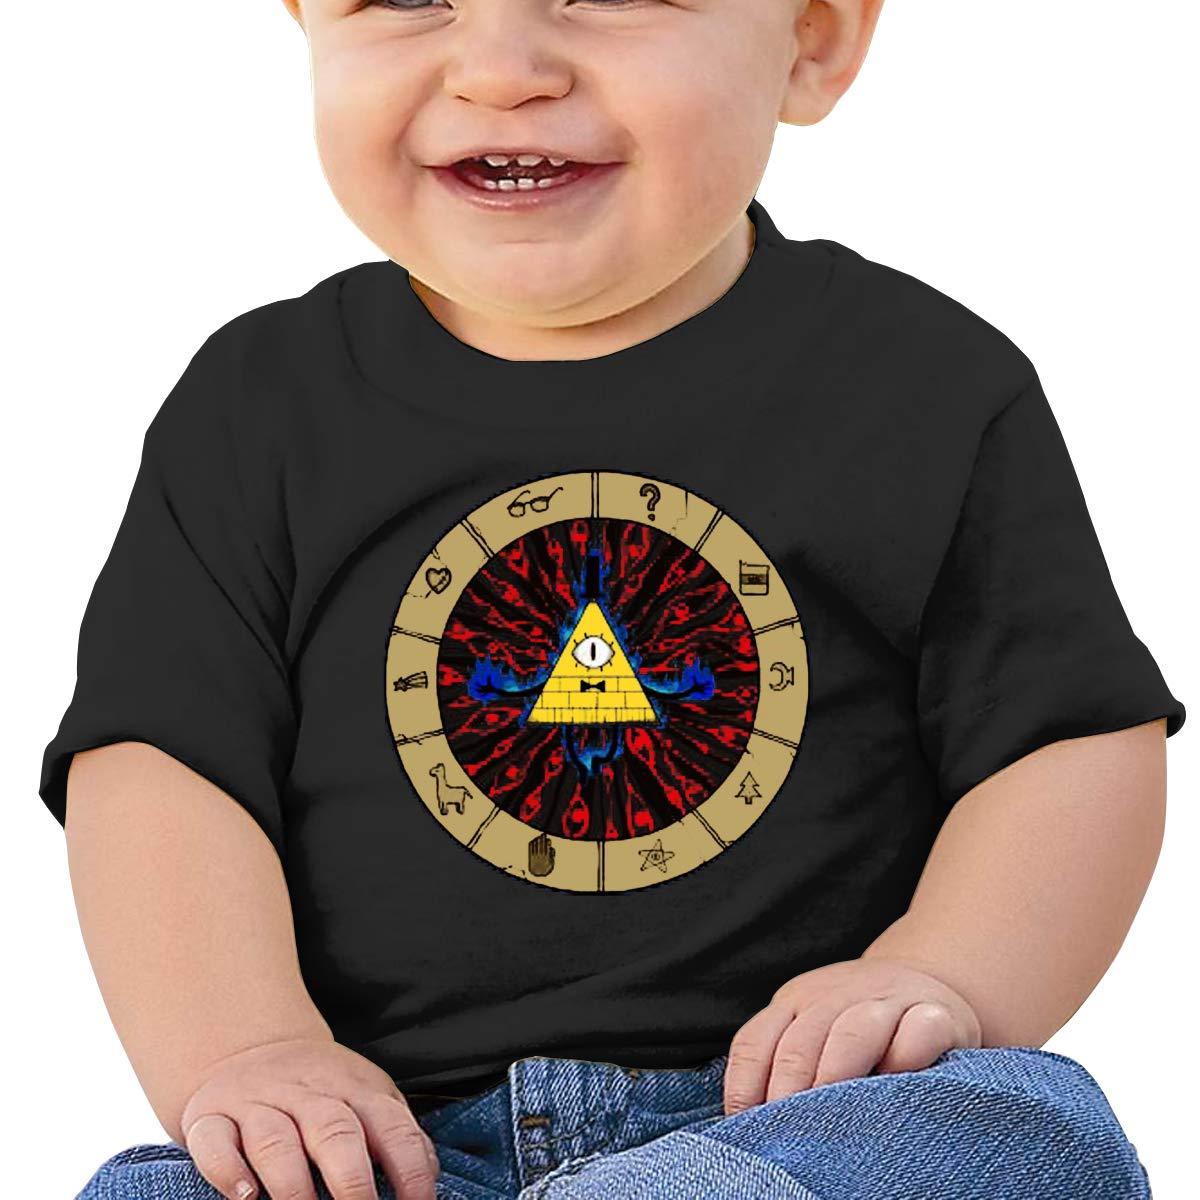 MONIKAL Unisex Infant Short Sleeve T-Shirt Bill Cipher Gravity Fall Toddler Kids Organic Cotton Graphic Tee Tops